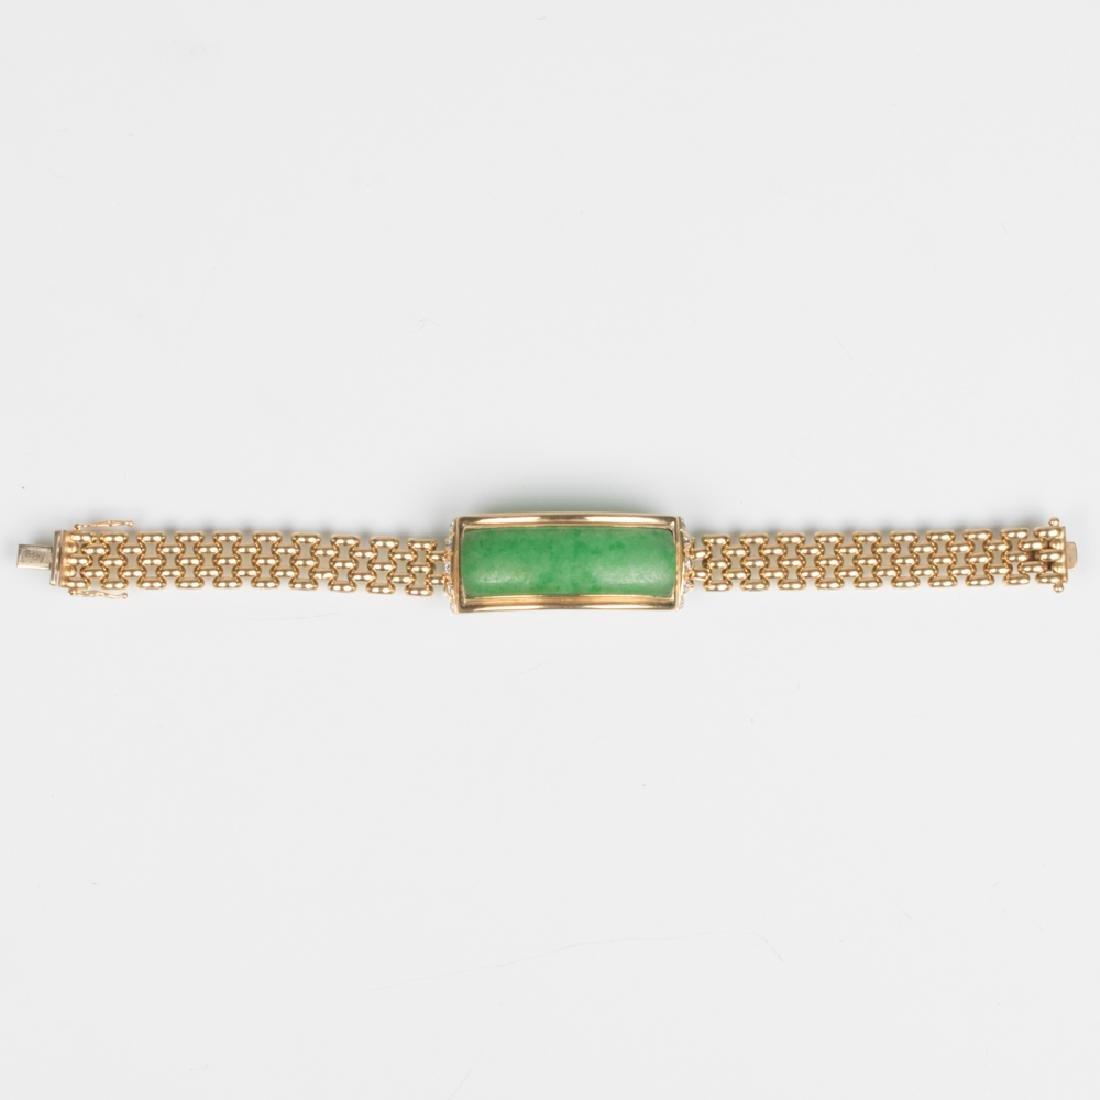 A 14kt. Yellow Gold, Green Jade and Diamond Bracelet, - 2